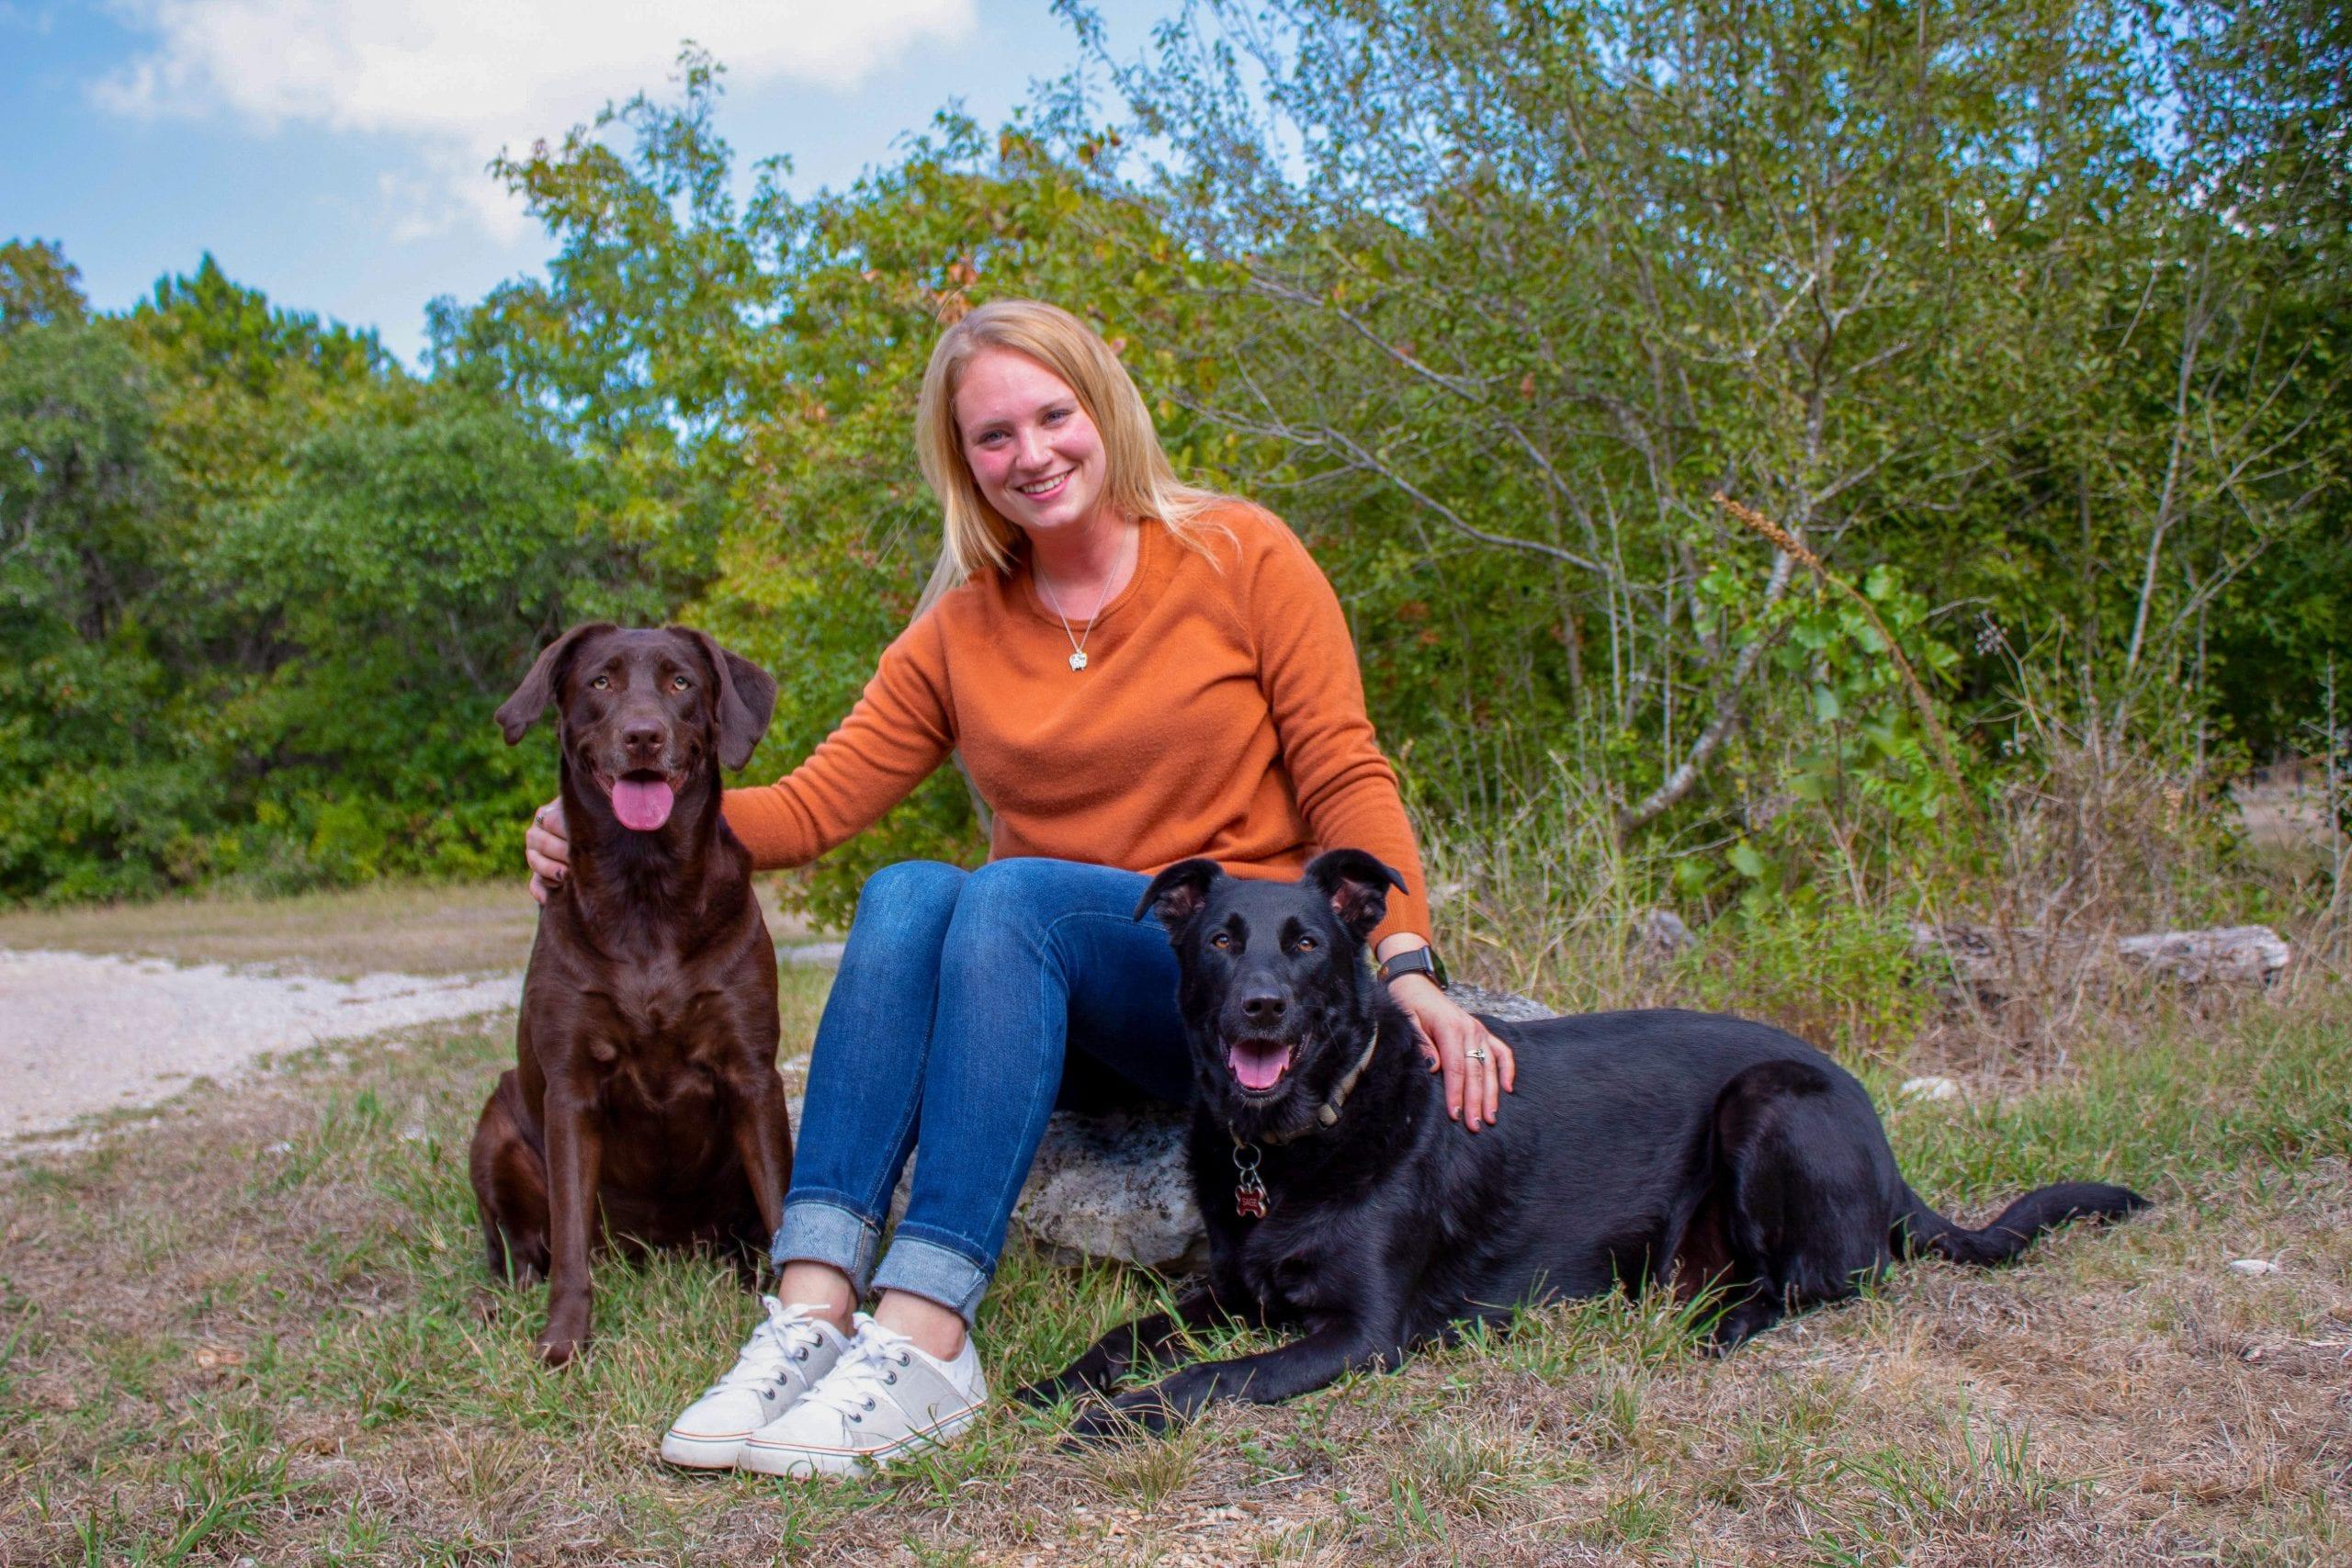 Katy Mullan – Cell Culture Associate